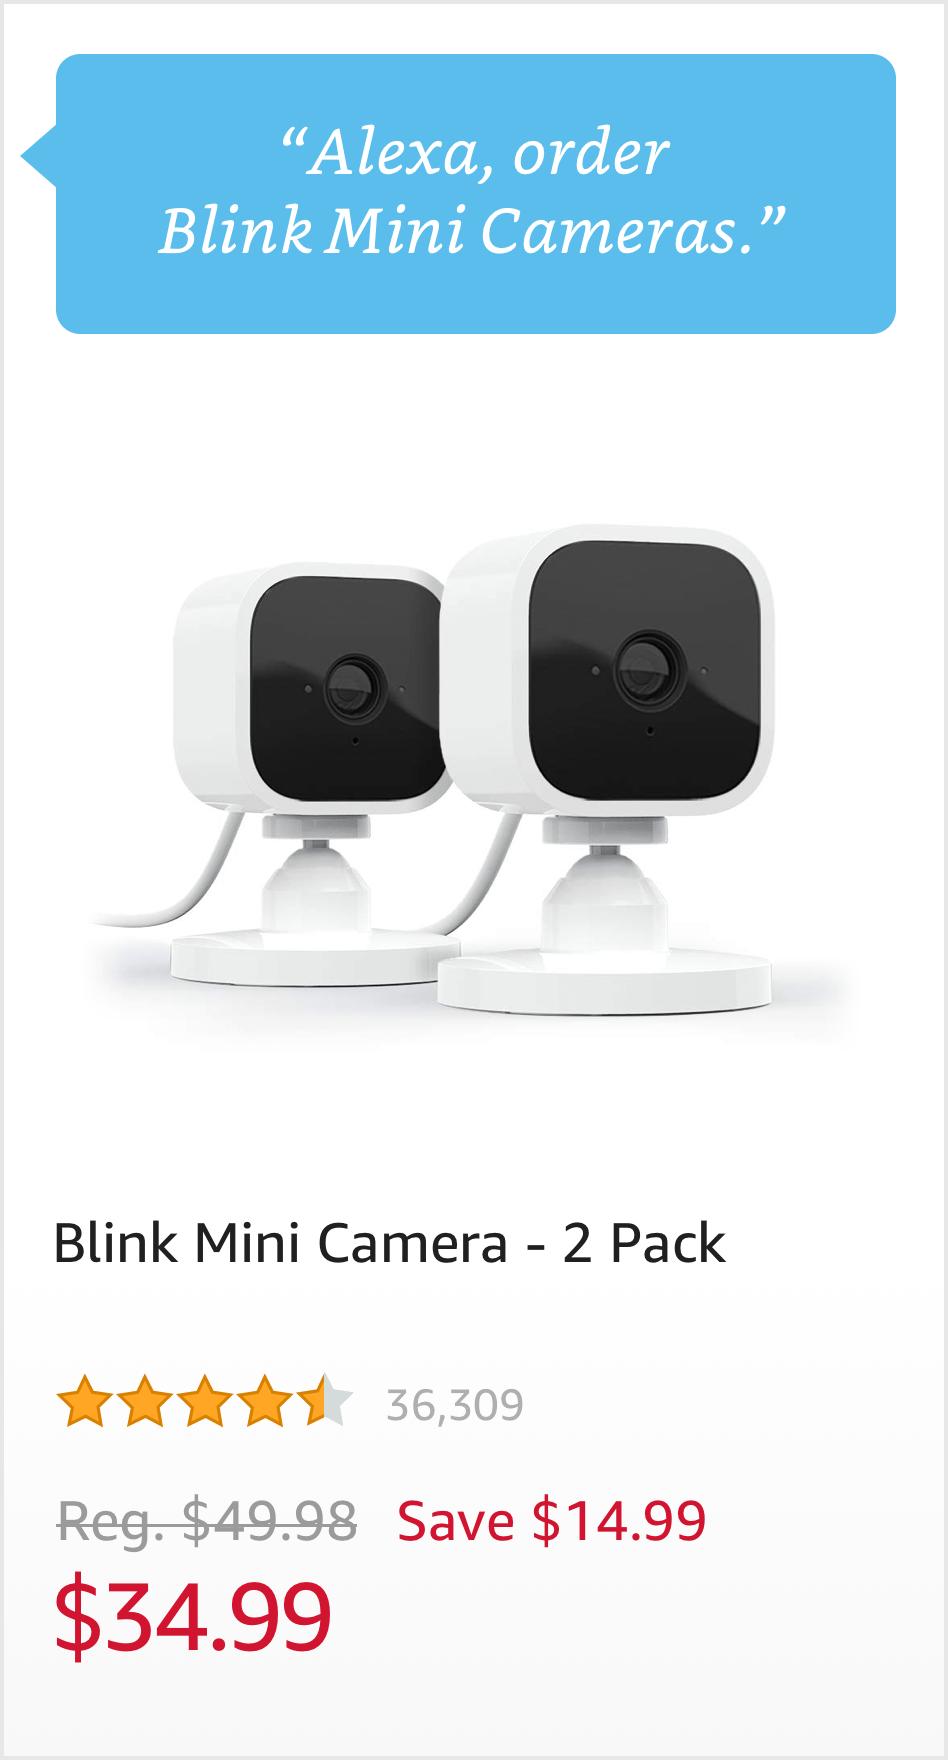 """Order Blink Mini Cameras."" $34.99"